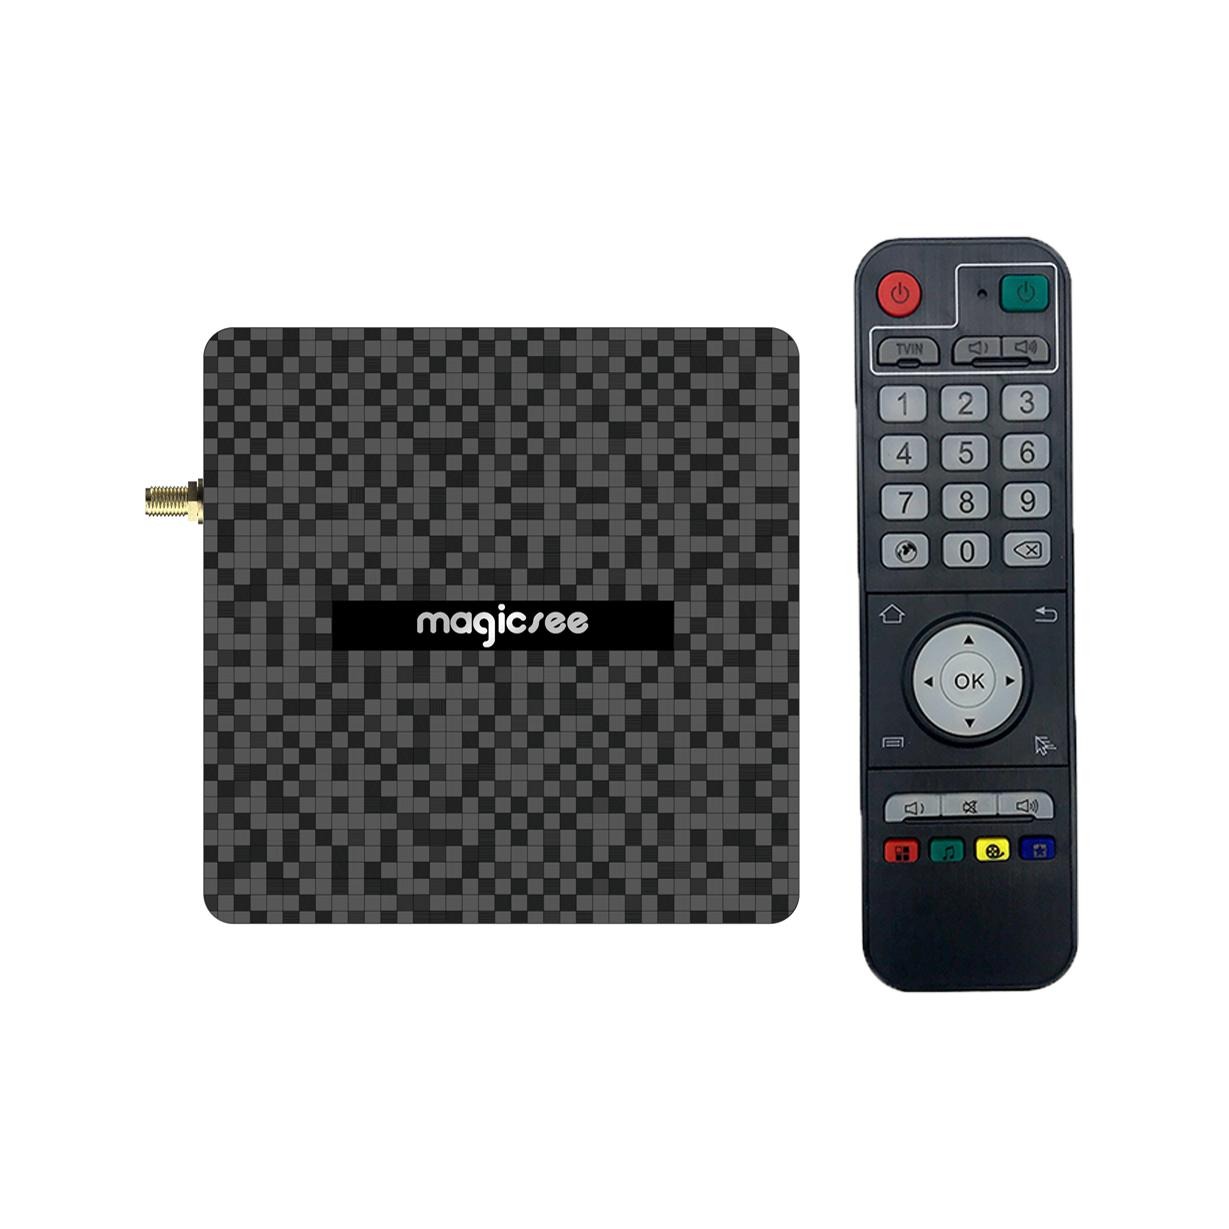 TV Box Smart Android 9.0 DDR4 4GB 32GB/64GB N6 Plus Amlogic S922X Dual Wifi Bluetooth Gigabit Ethernet Media Player Set Top Box black_4 + 32GB U.S. regulations